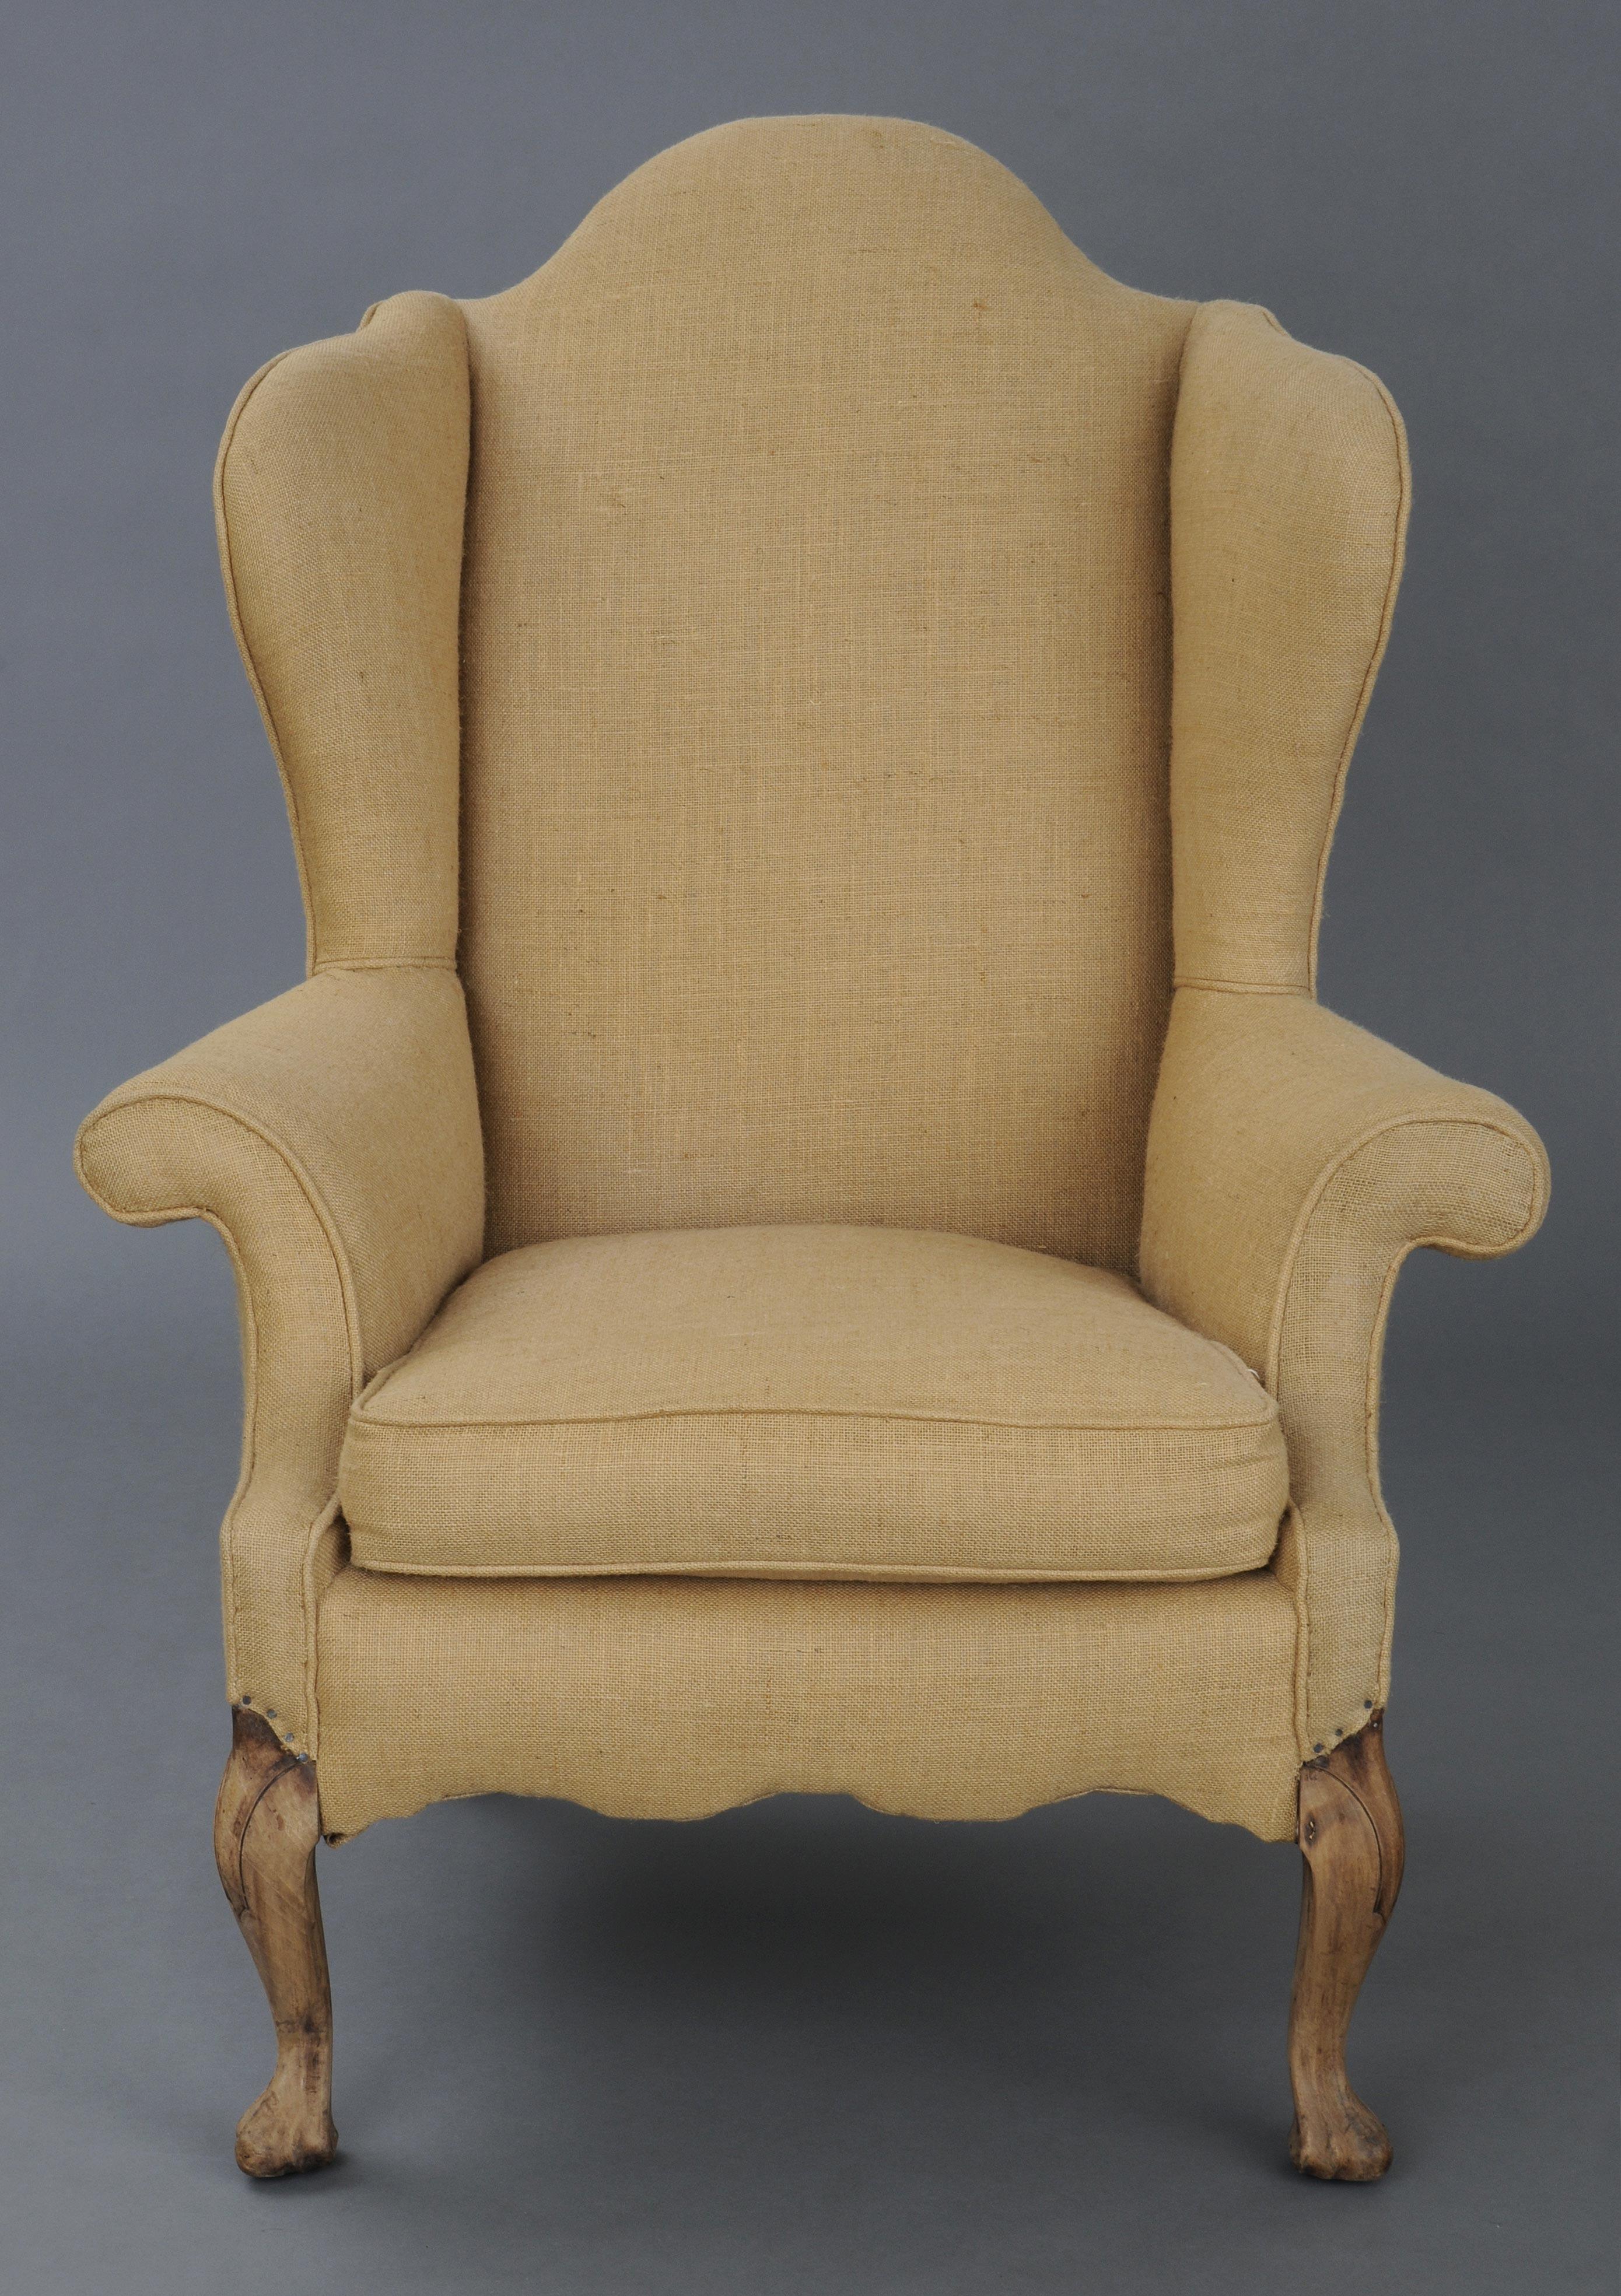 Antique wing chair -  English Antique Georgian Walnut Wing Chair